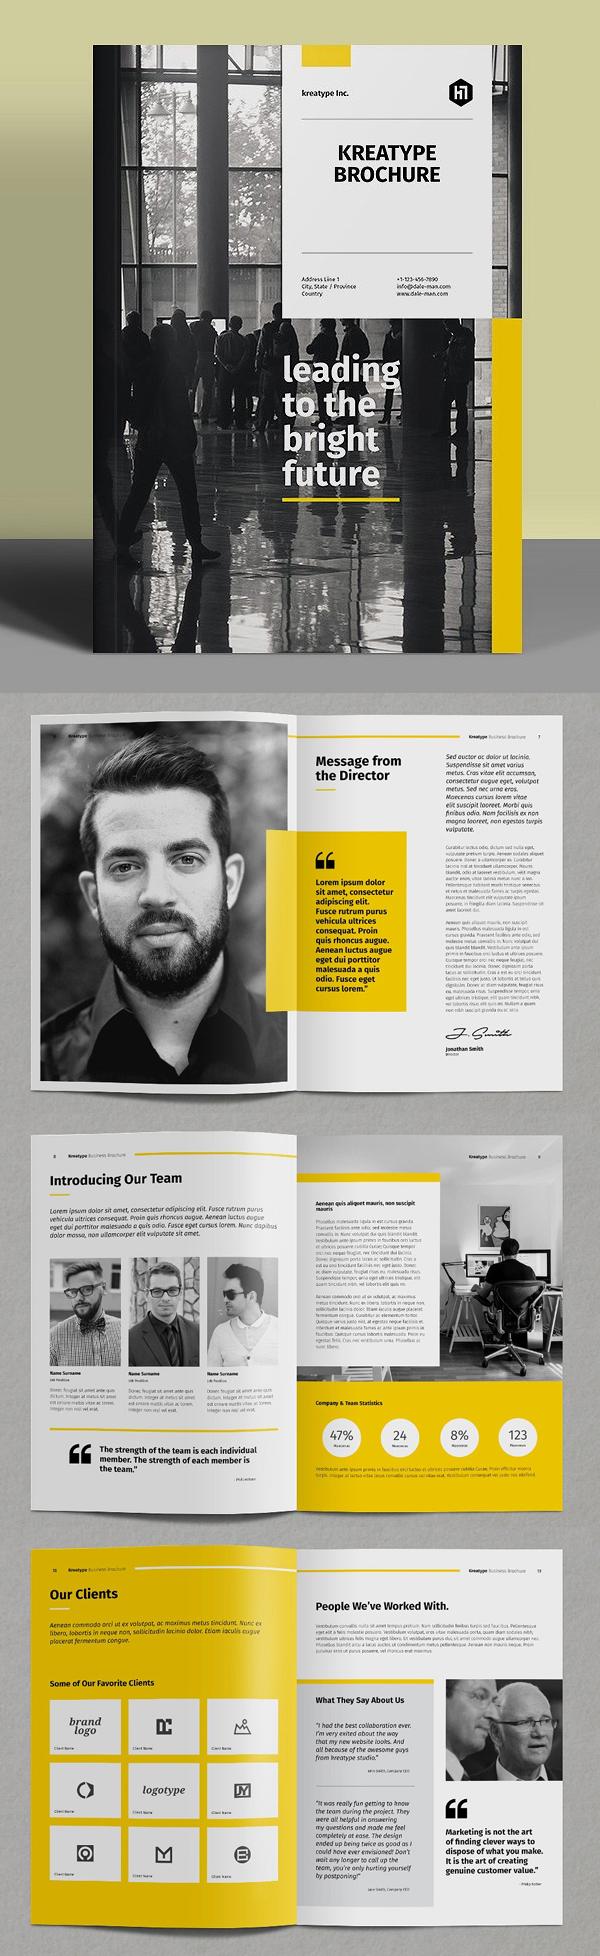 100 Professional Corporate Brochure Templates - 31